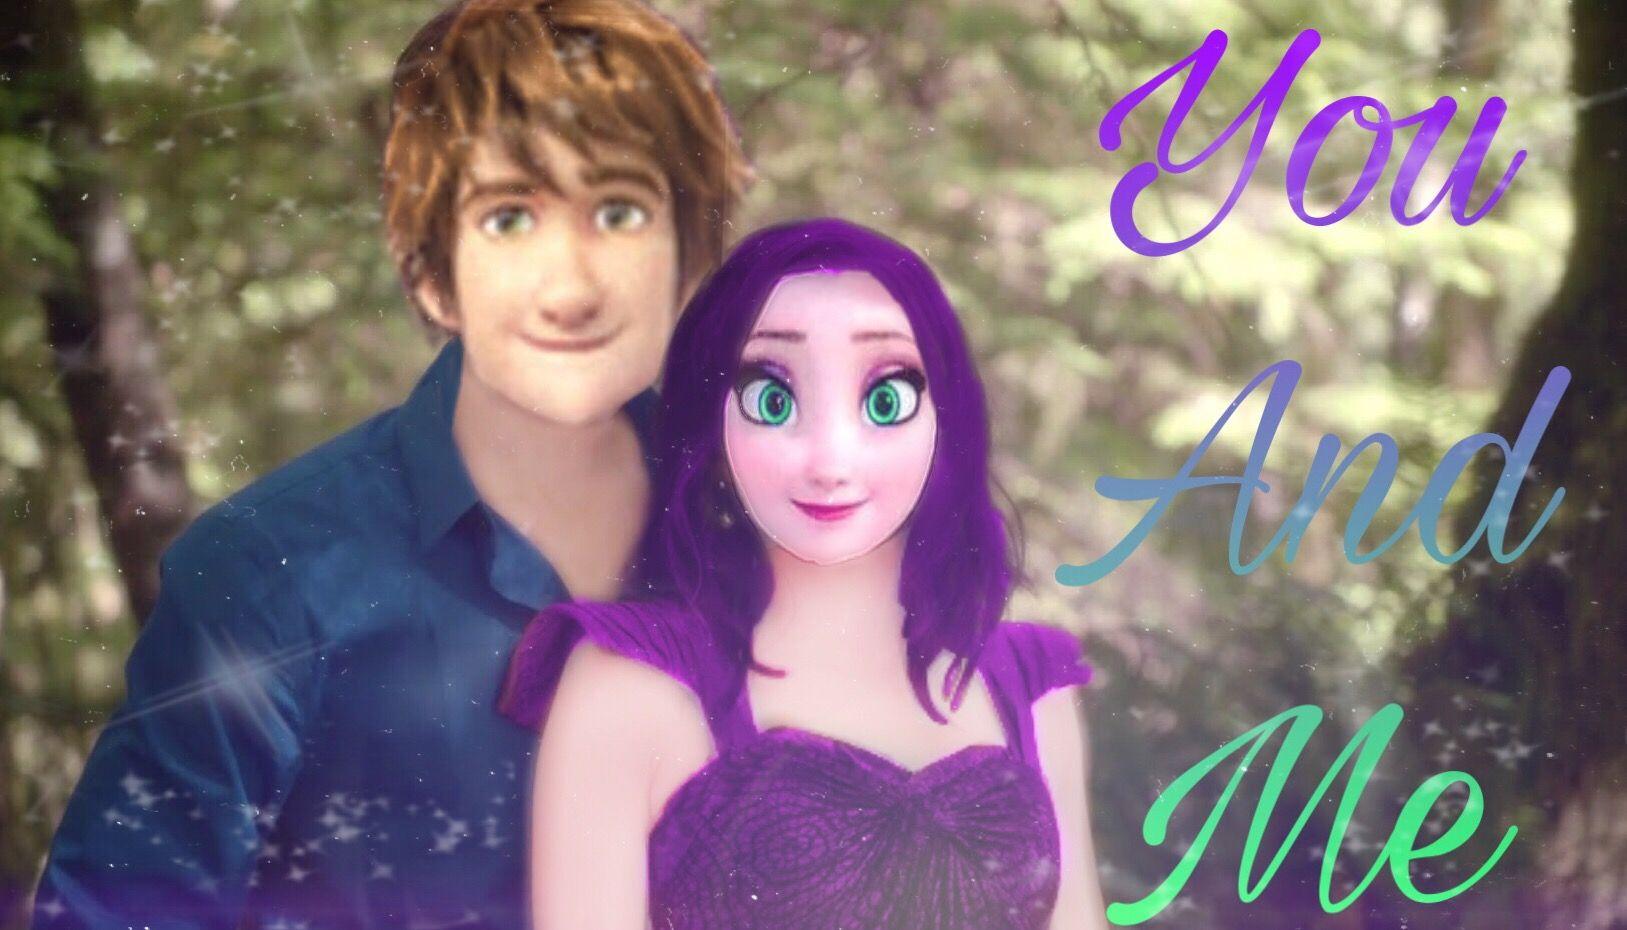 #Descendants #Hiccelsa #Mal #Ben #Hiccup #Elsa #hiccuphorrendoushaddockiii #Frozenelsa #nondisney #nondisneydescendants #ifonly #lovespell #freetoedit